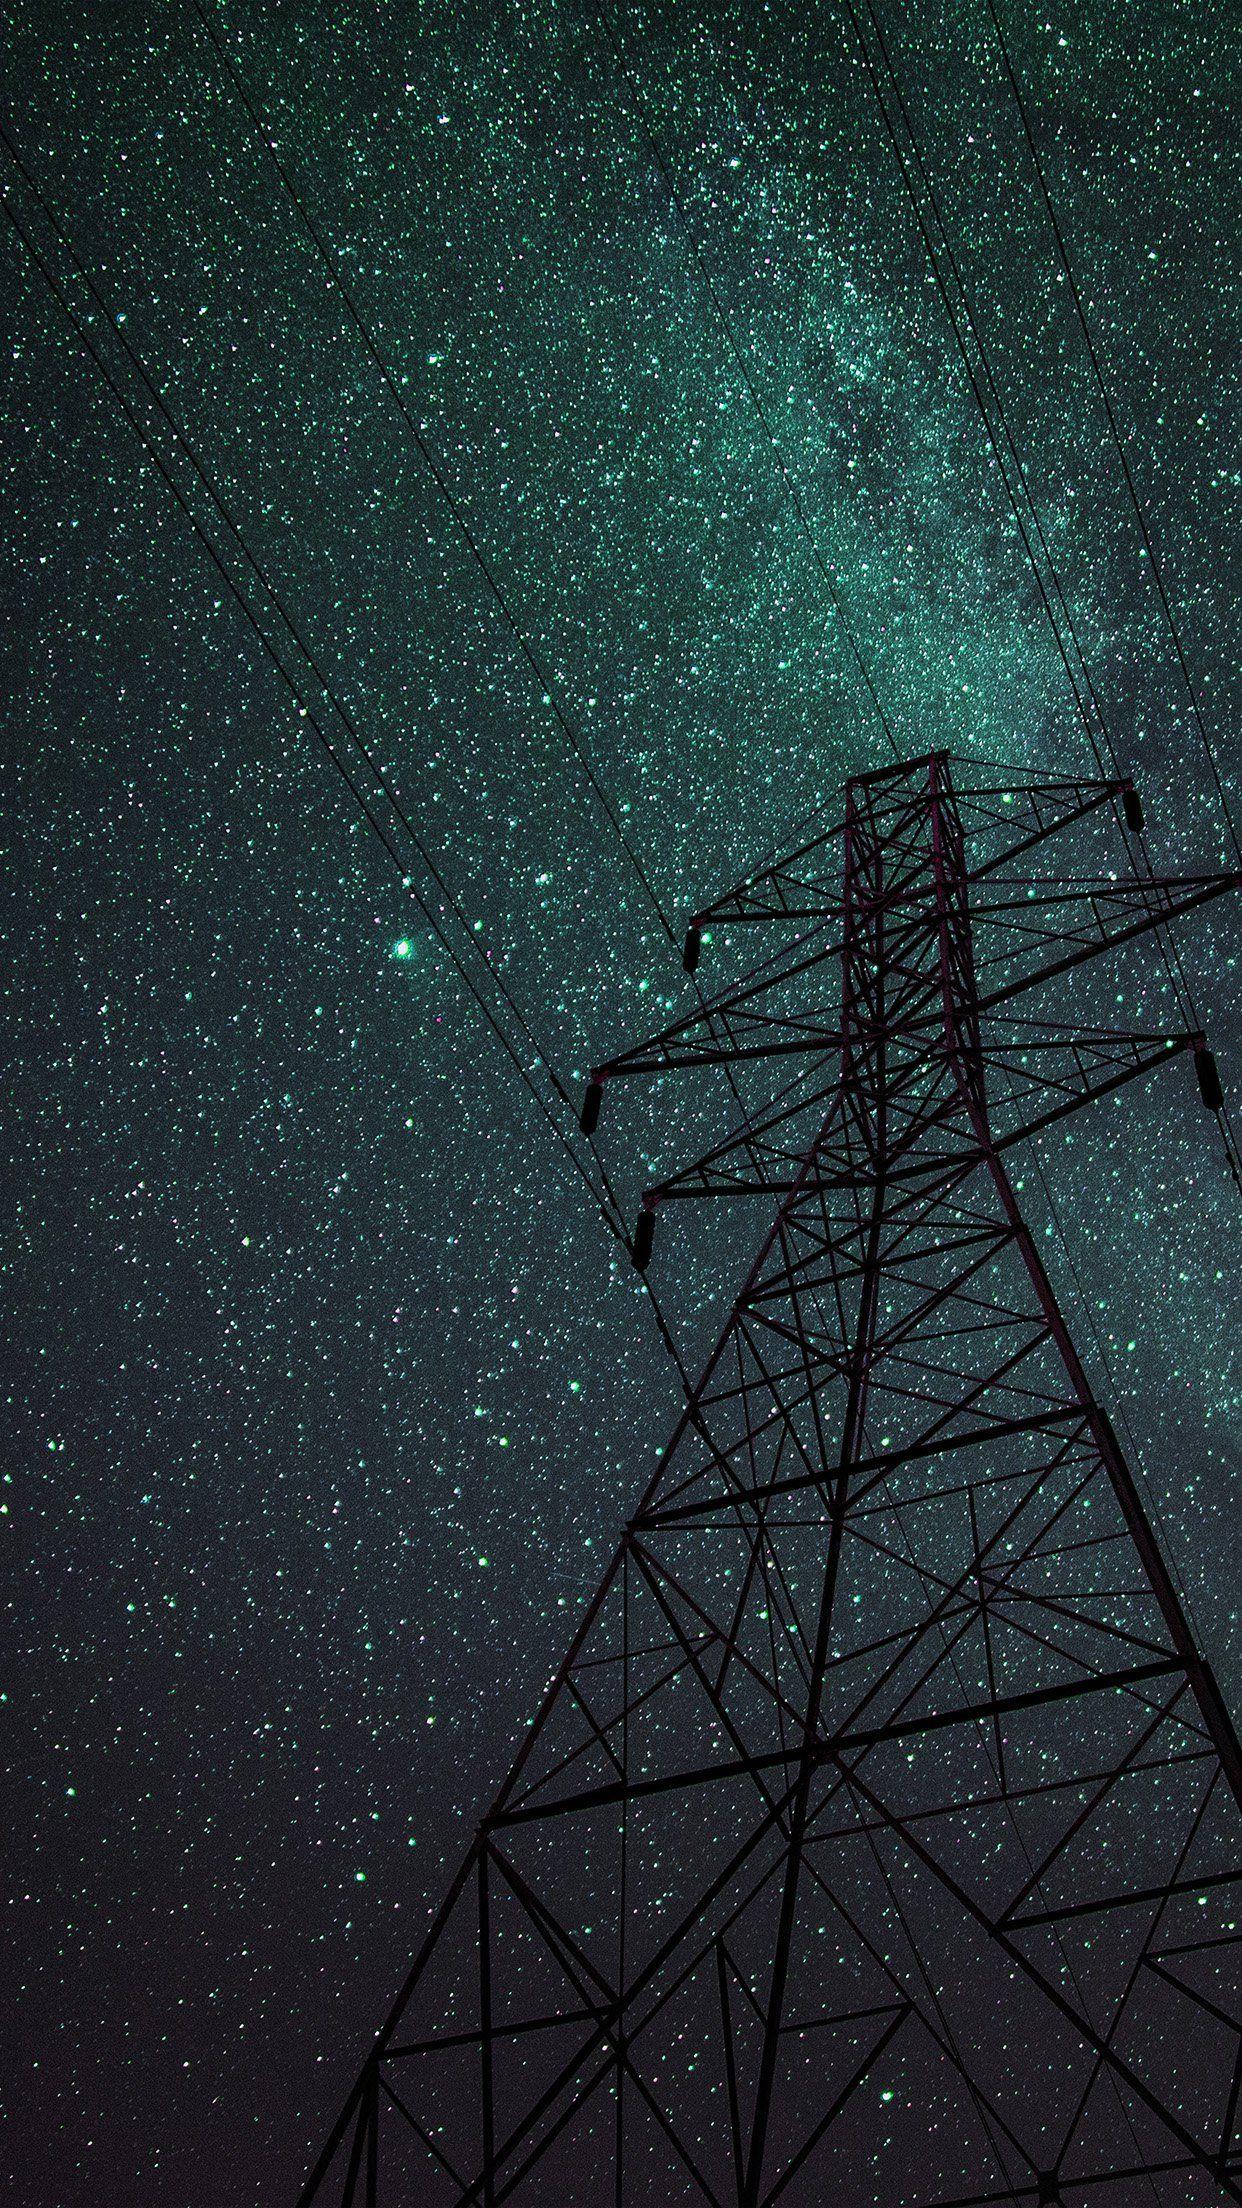 Night Sky Iphone Wallpapers in 2020 Iphone wallpaper sky